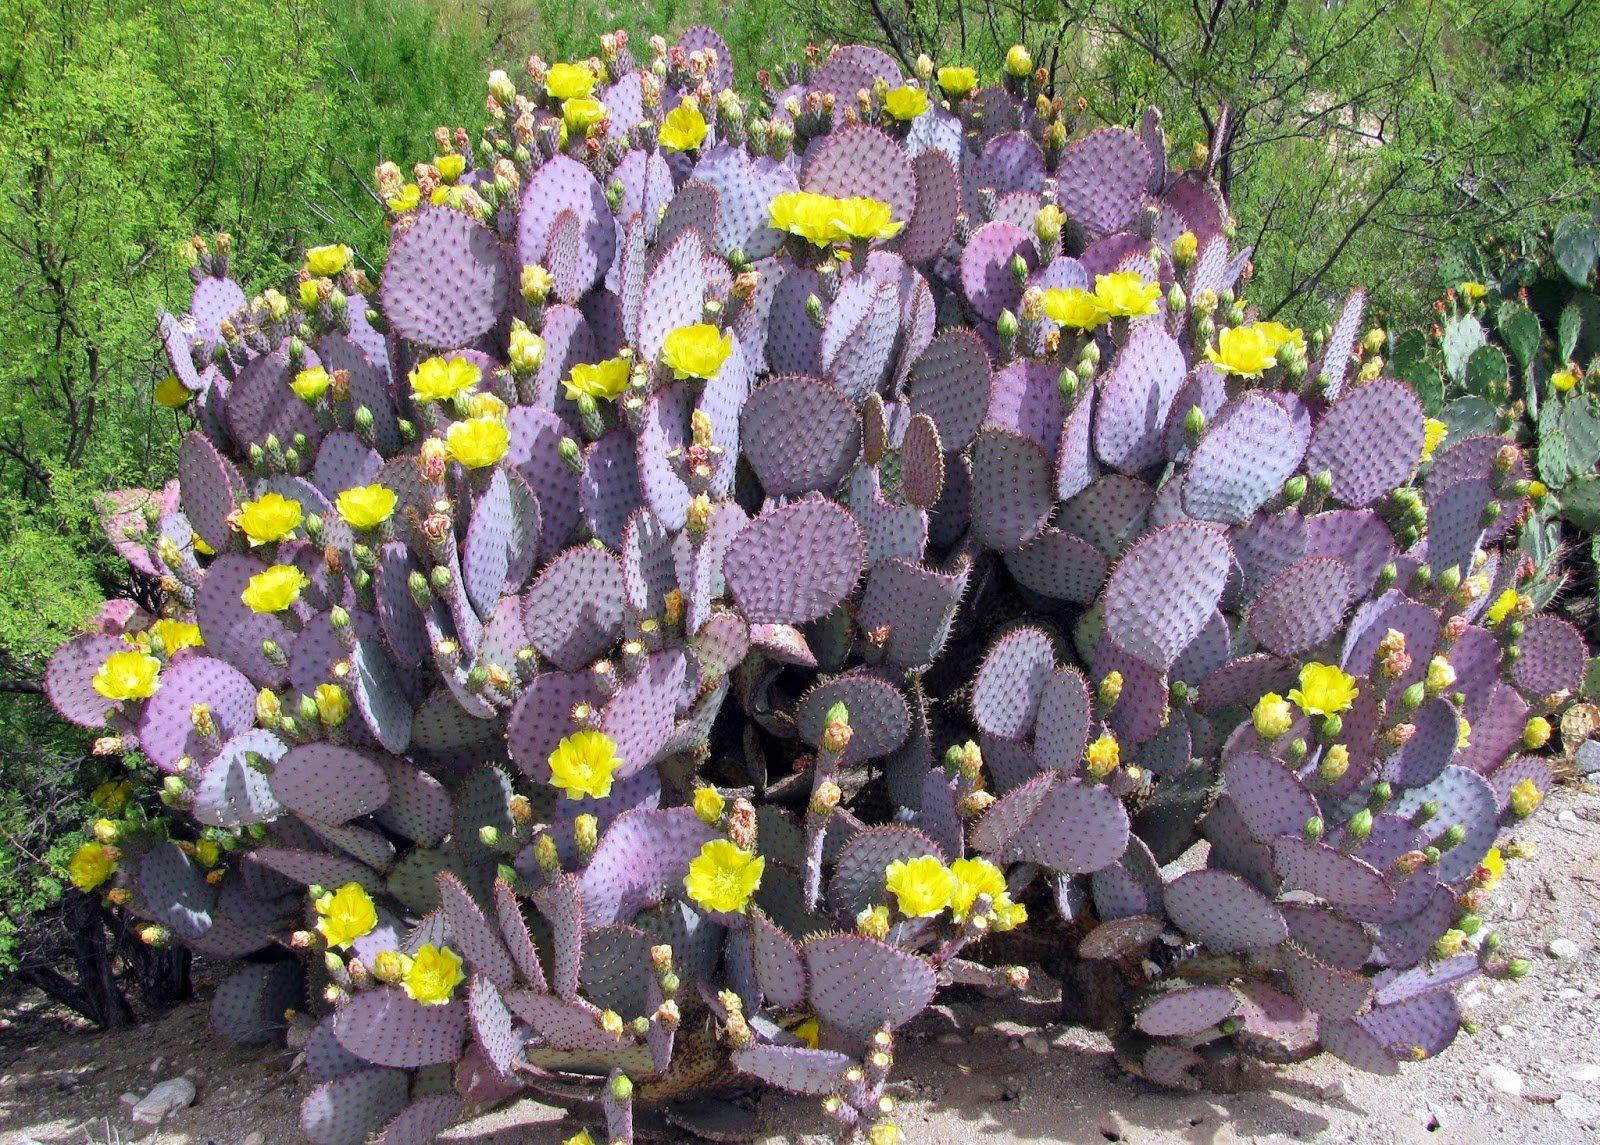 Purple Prickly Pear Cactus - Victors Landscaping